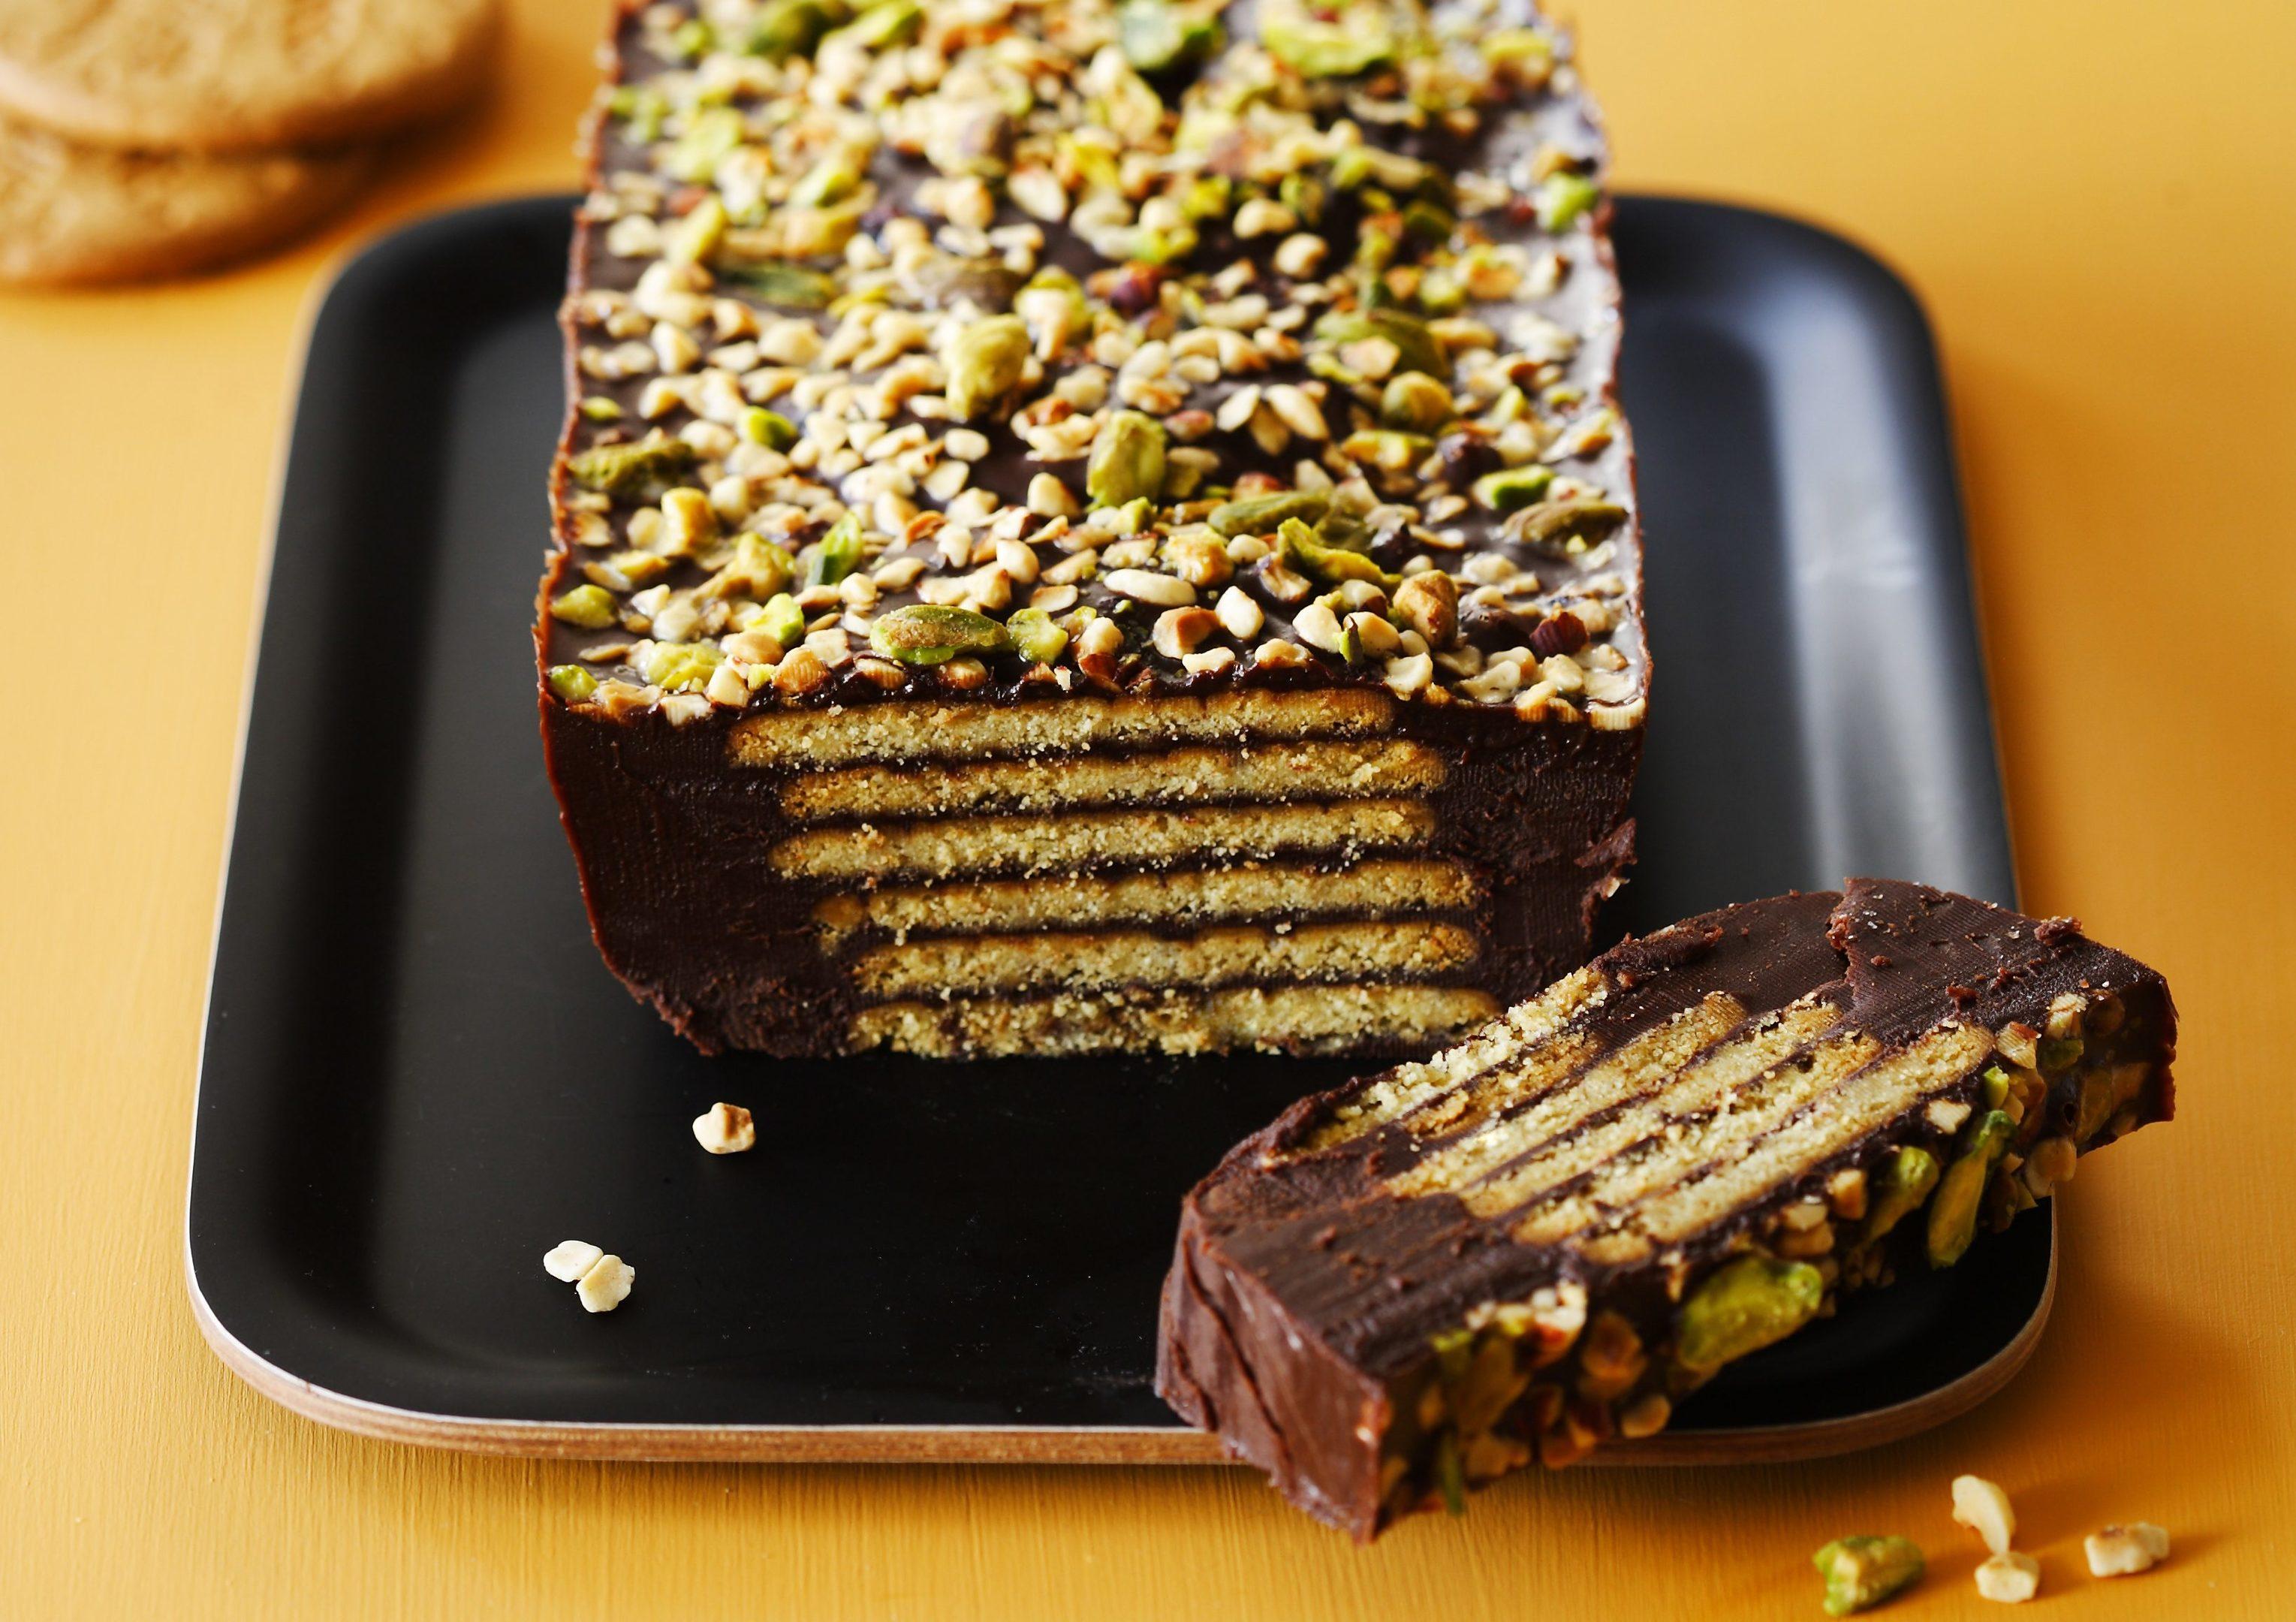 Chocolate Digestive Cake (McVitie's)